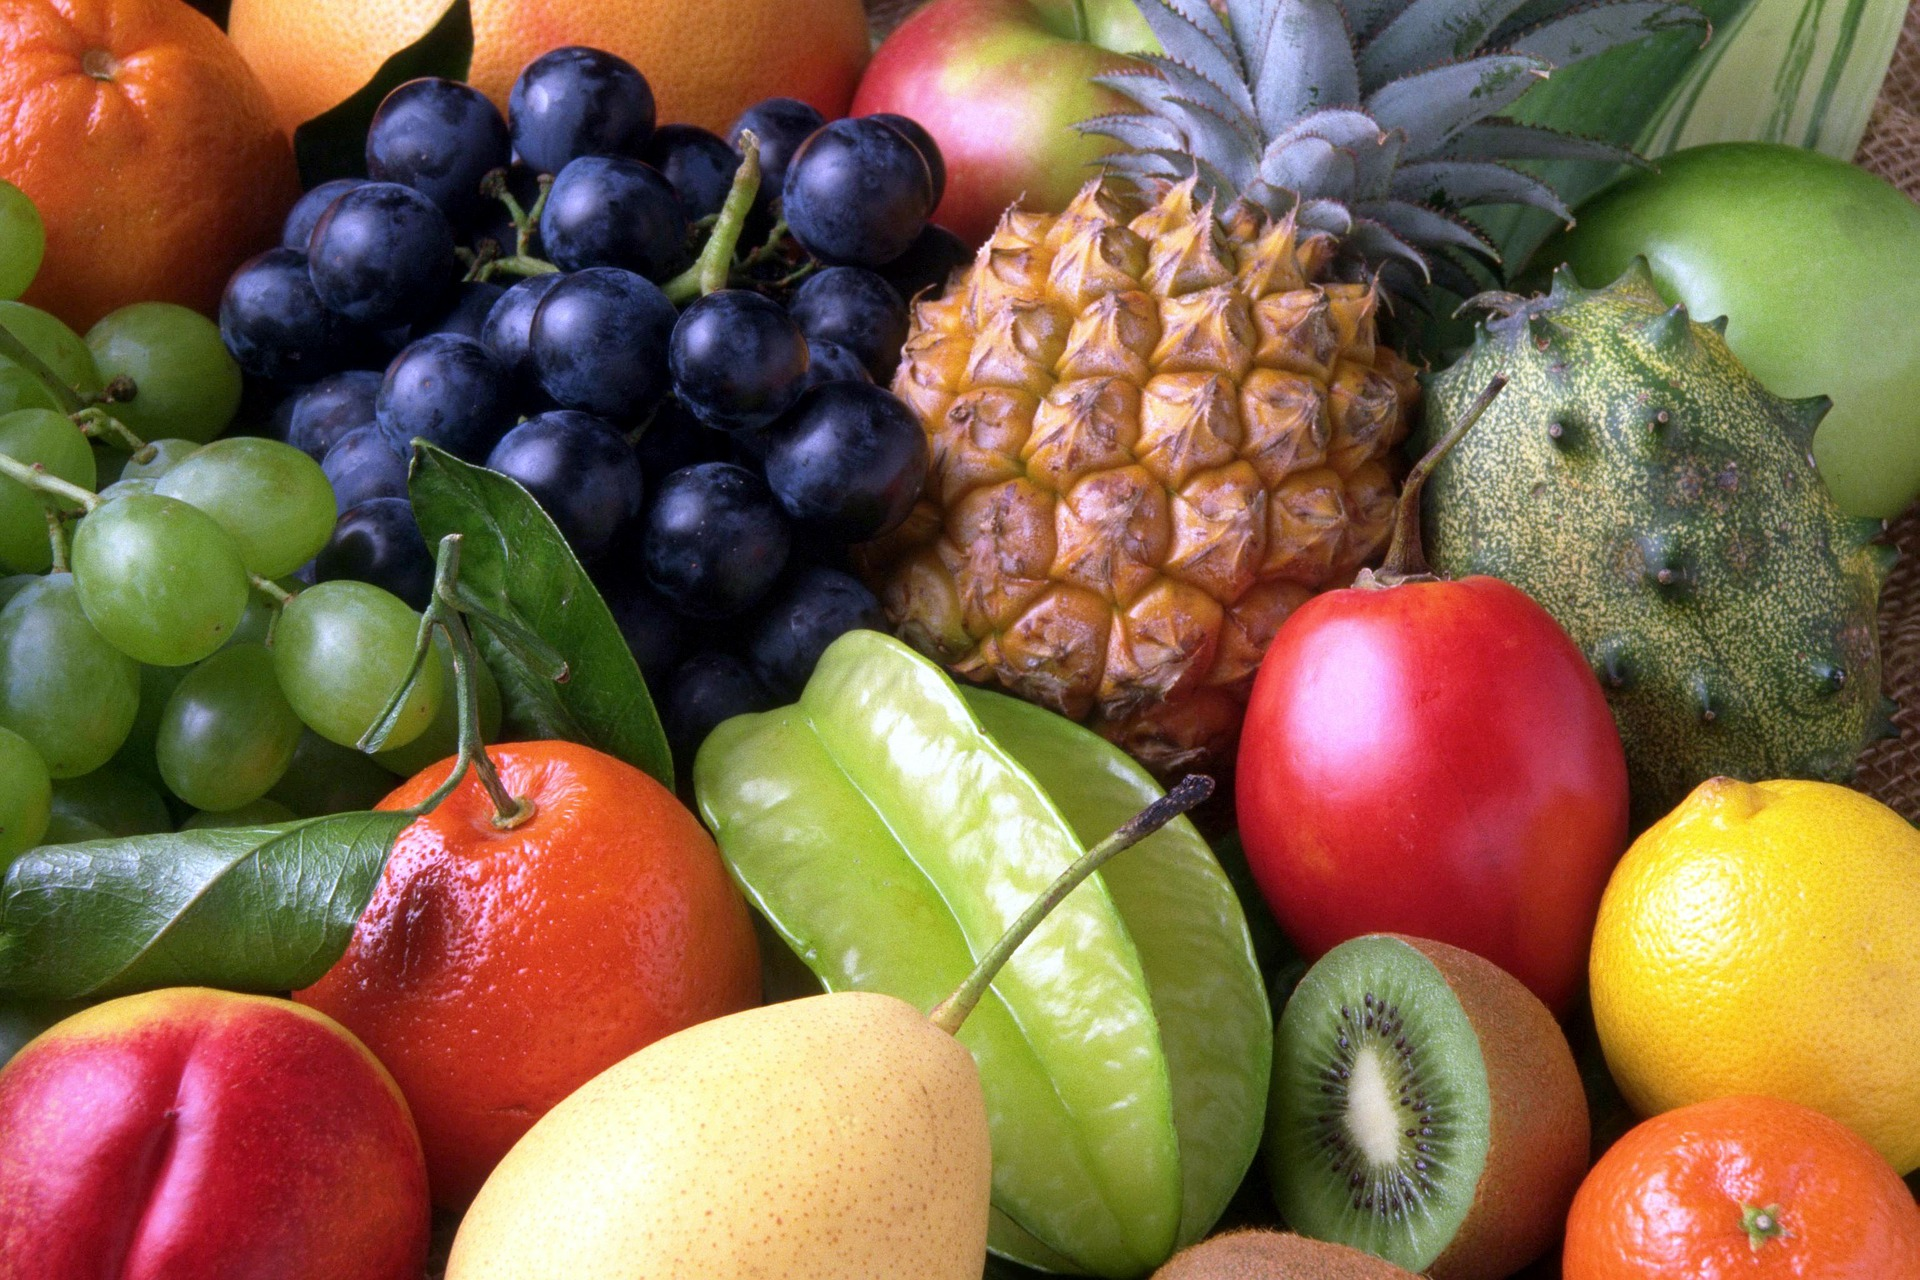 Gesunde Ernährung: Obstkorb